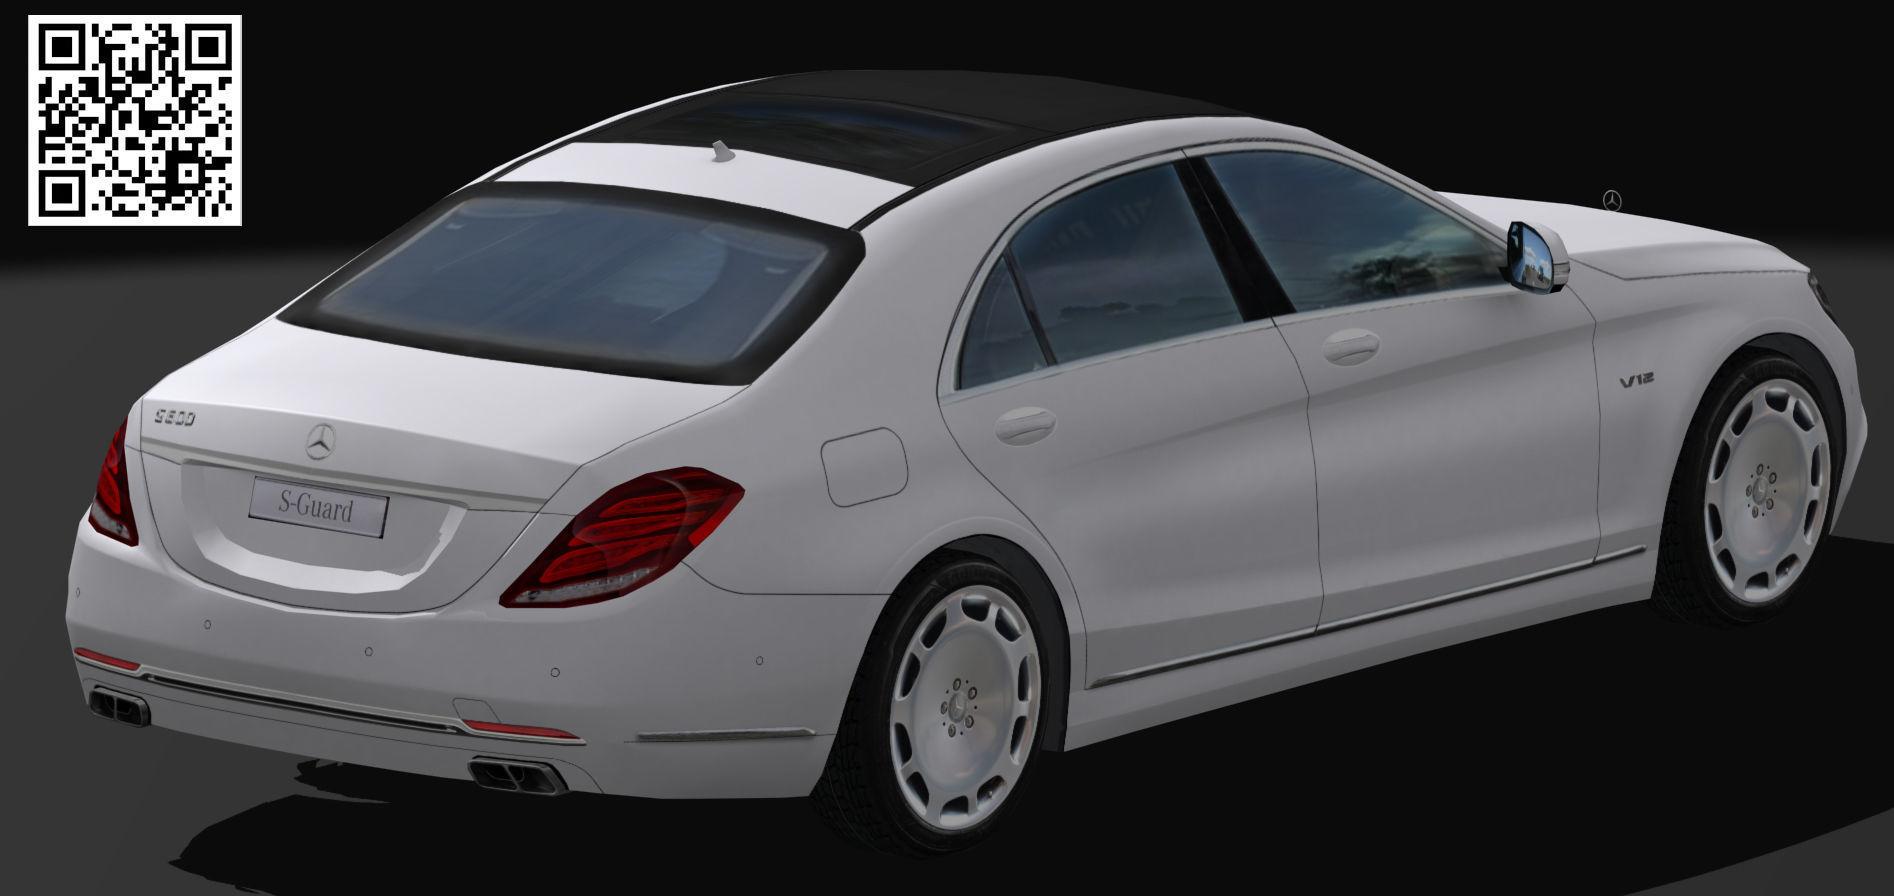 Mercedes Benz S-Guard white   DownloadFree3D.com on mercedes-benz s600 pullman guard, mercedes 600 pullman, mercedes benz g guard, mercedes e guard,